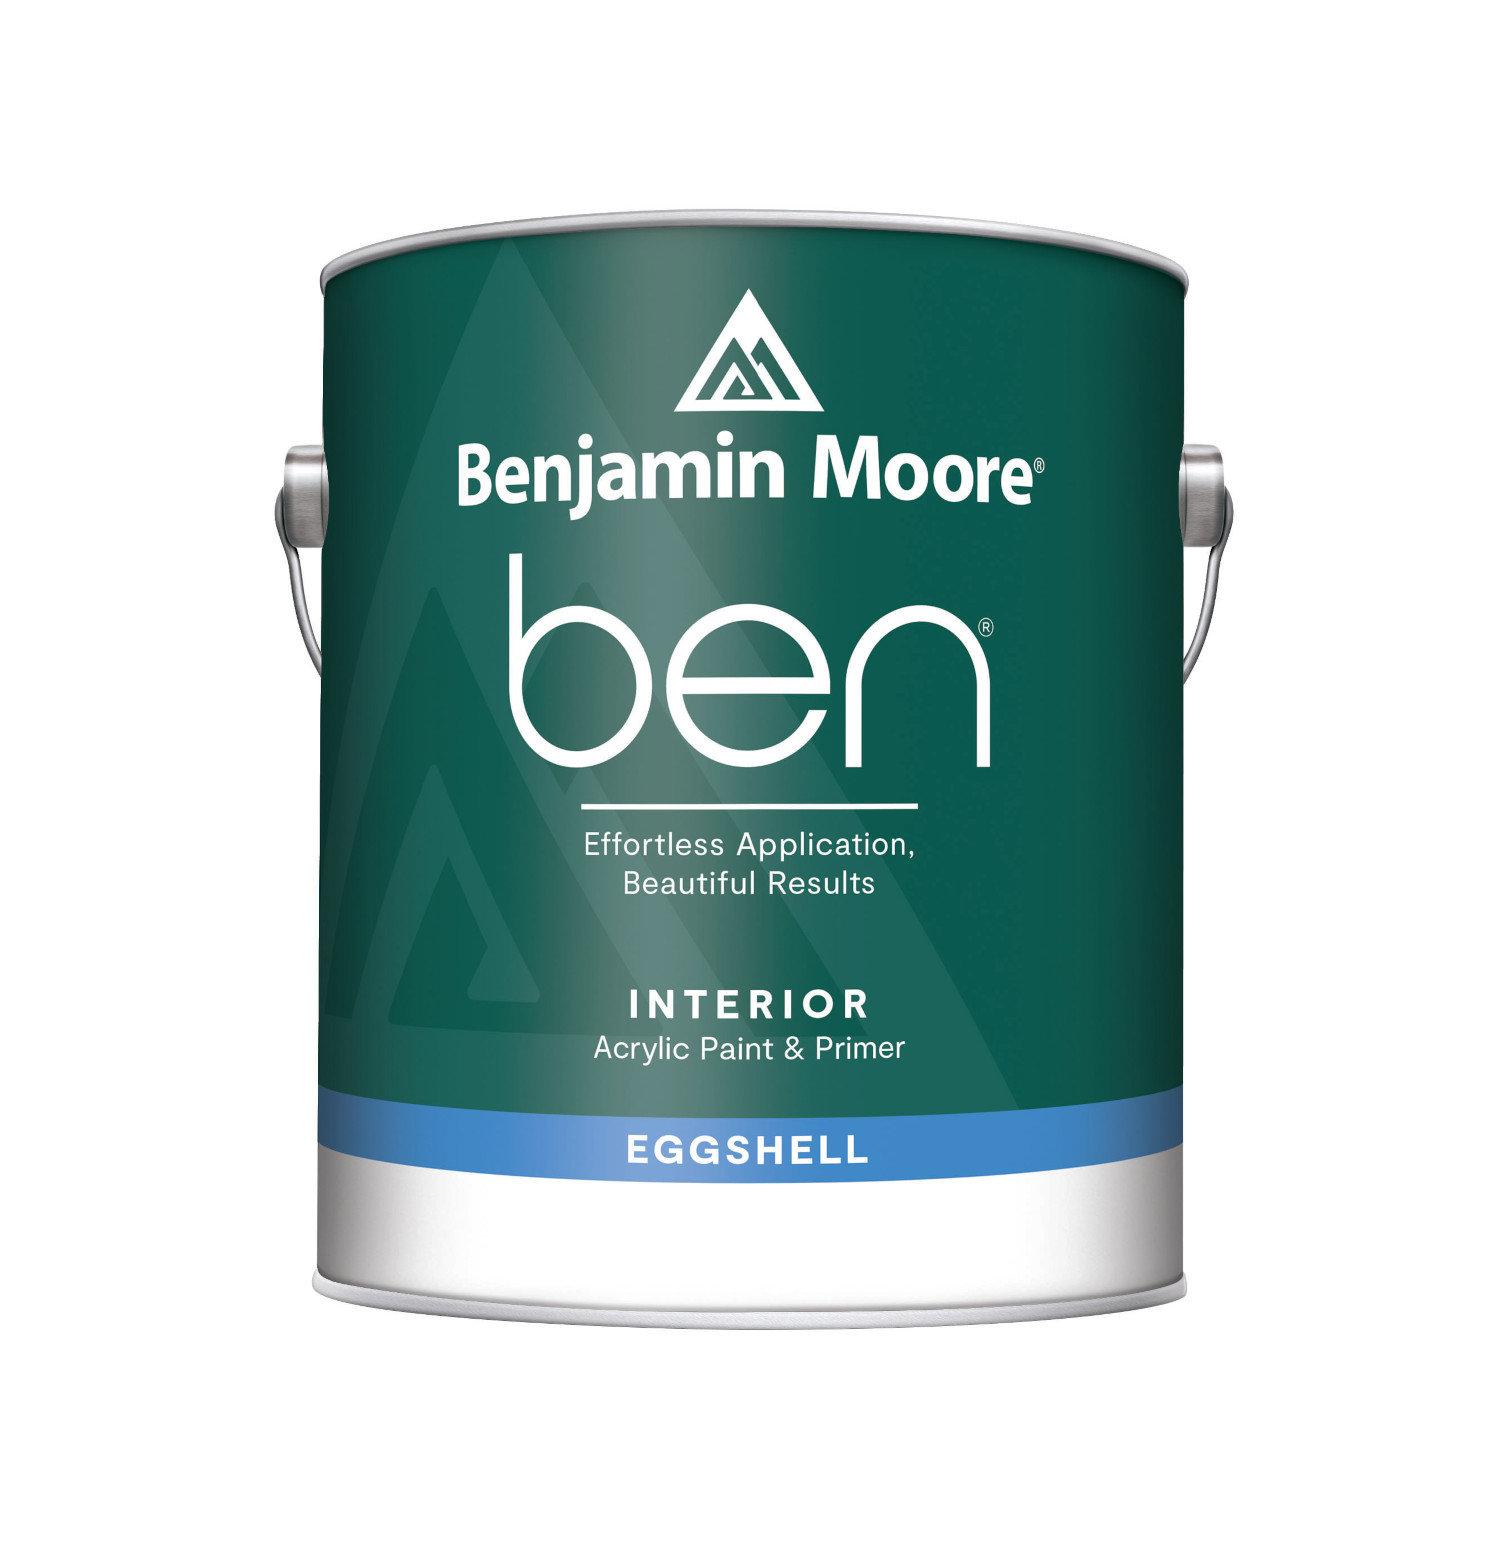 Benjamin Moore & Co. (United States) image | Benjamin Moore & Co. (United States)